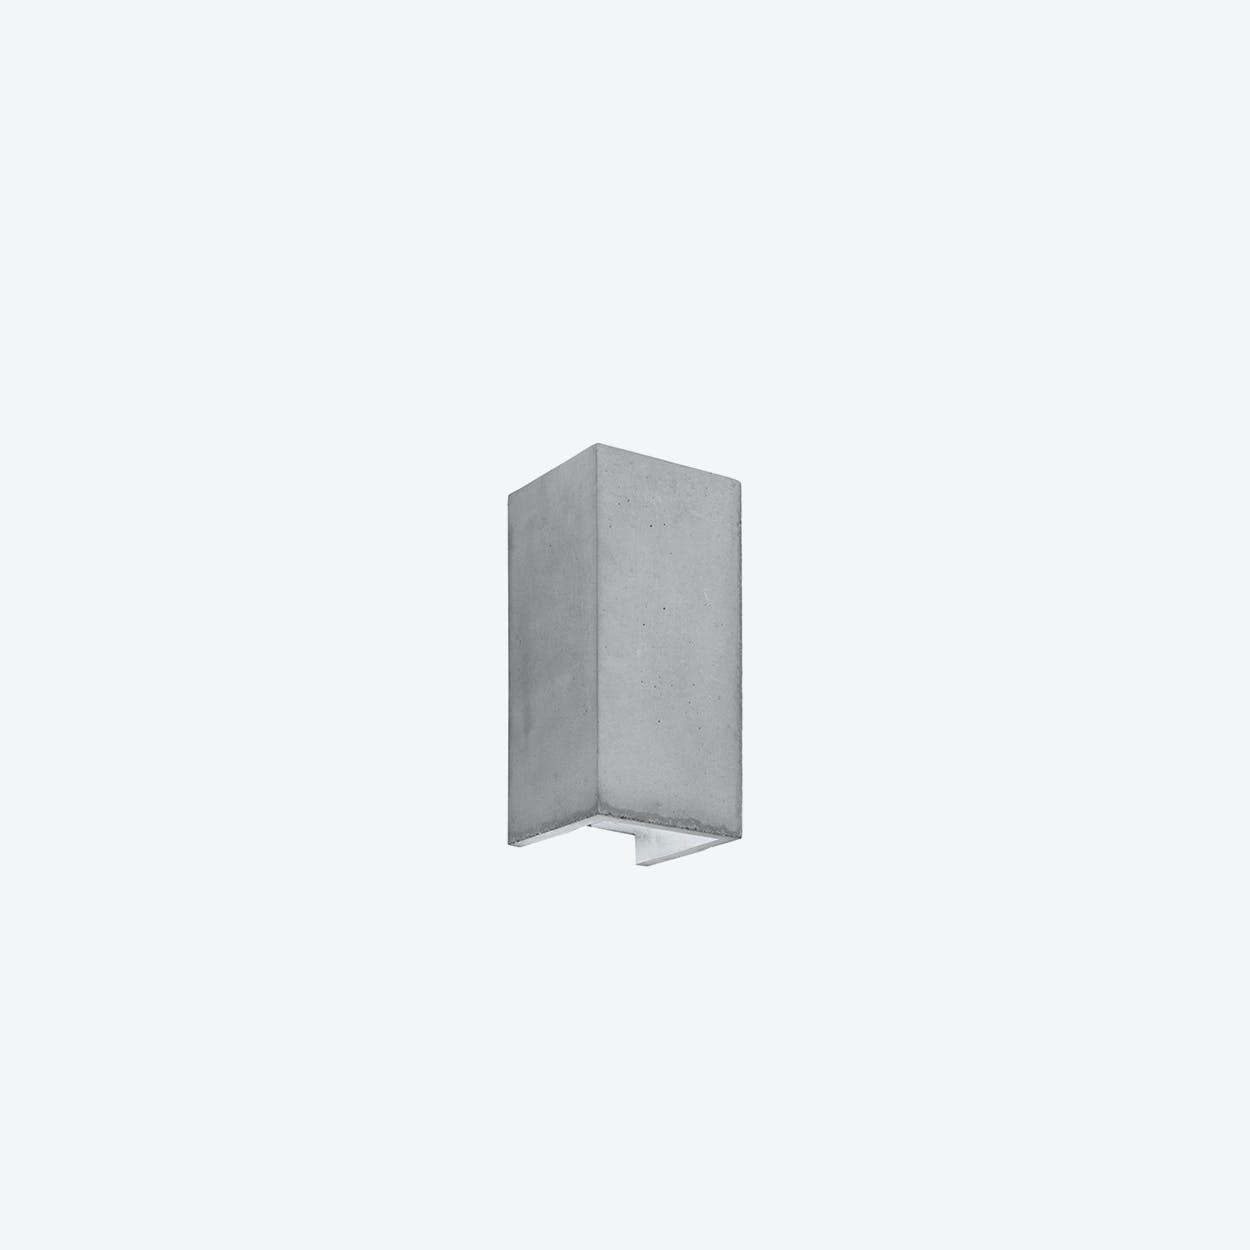 Concrete Wall Light Retangular B8 in Light Grey and Silver